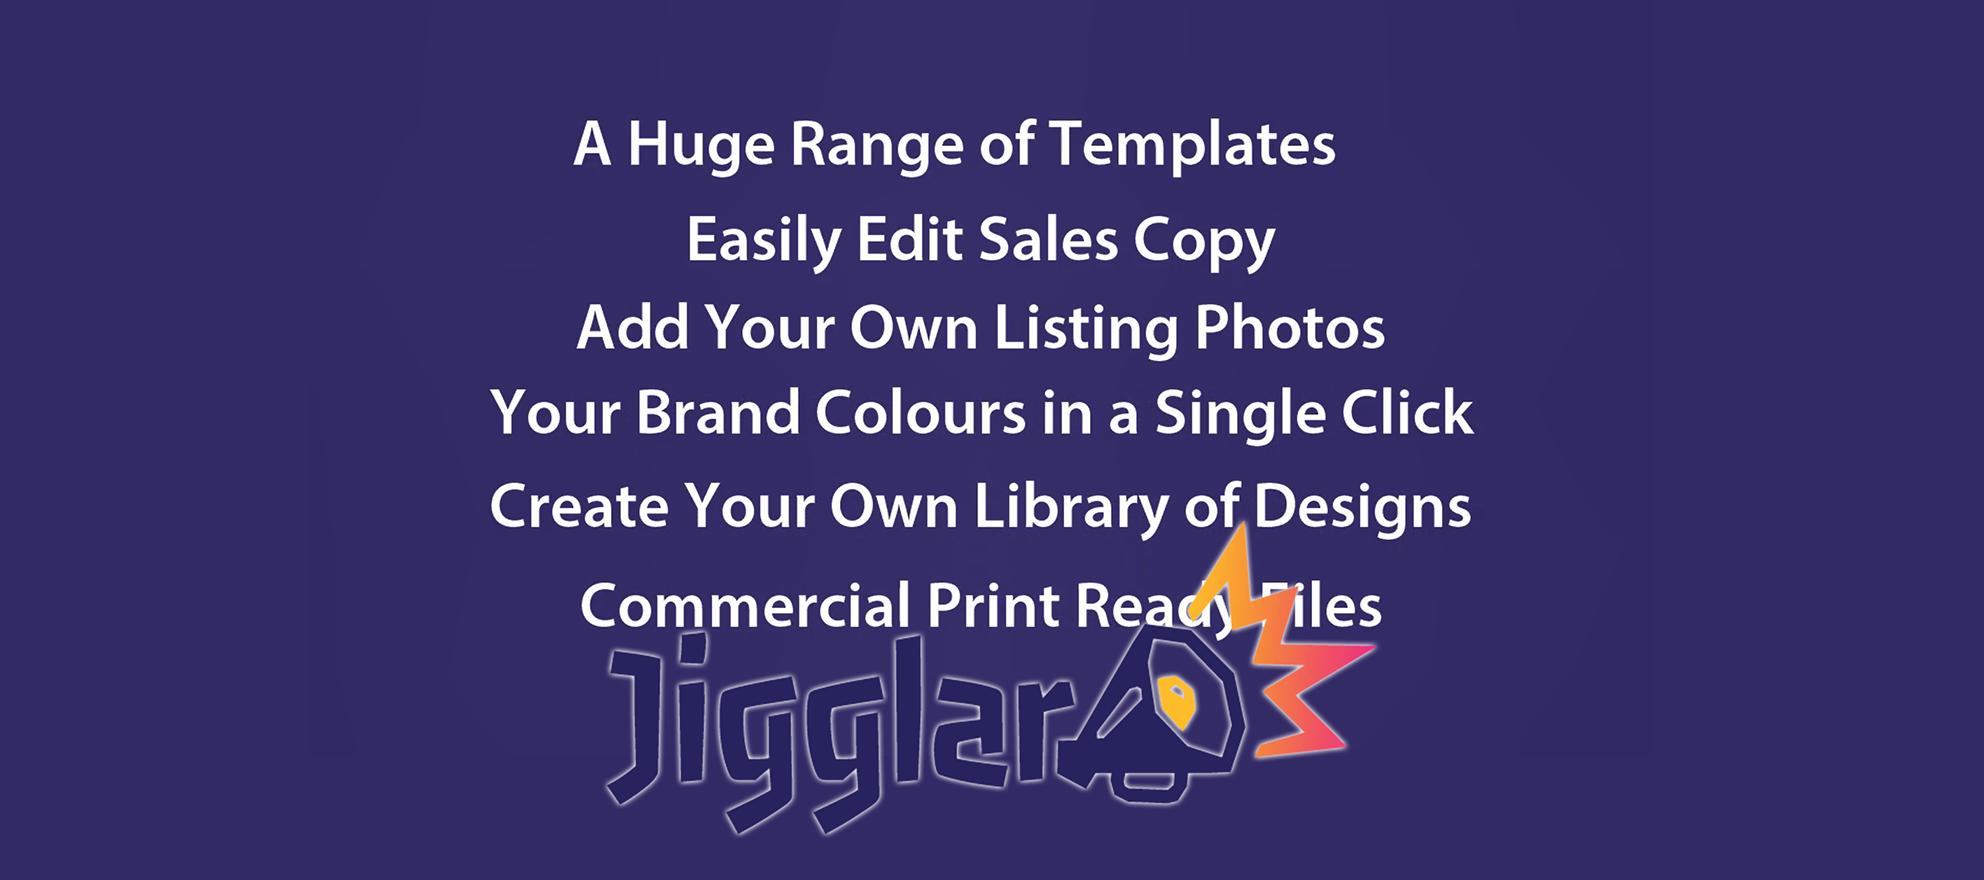 Jigglar Creative Marketing Tool for Agents